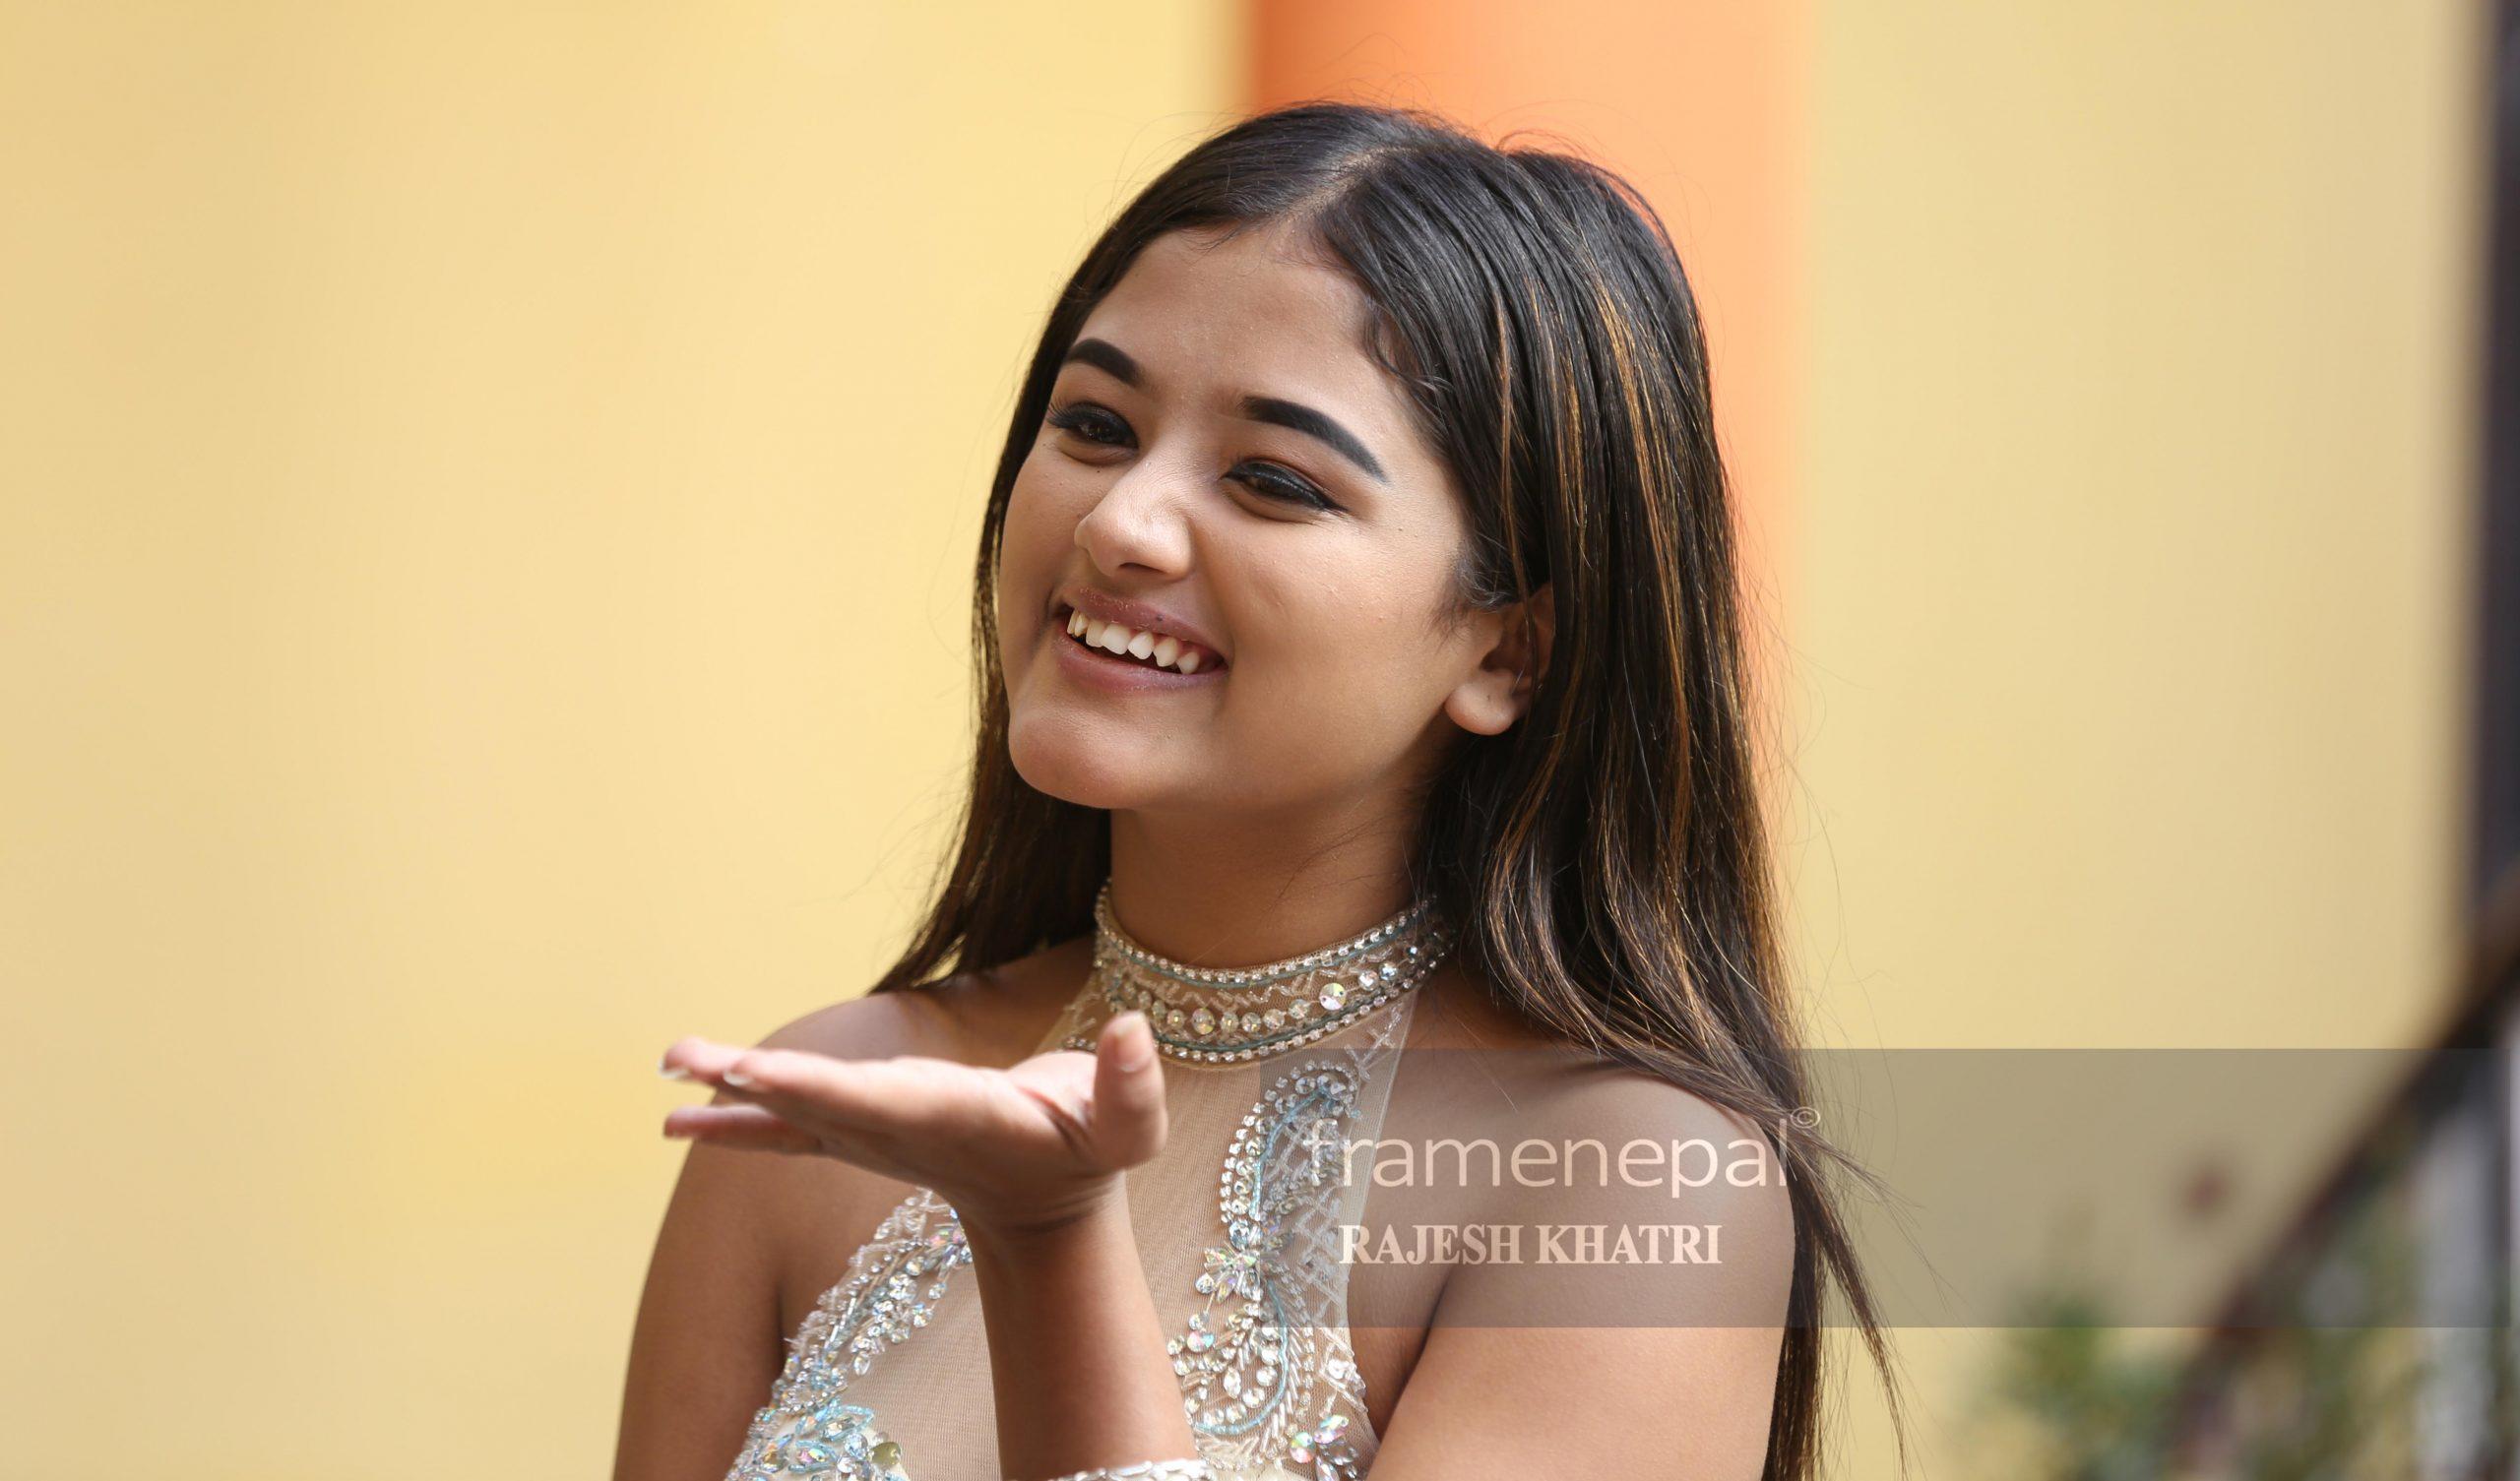 Samikshya Basnet, Best 7 Photos Of Actress Samikshya Basnet by frame nepal